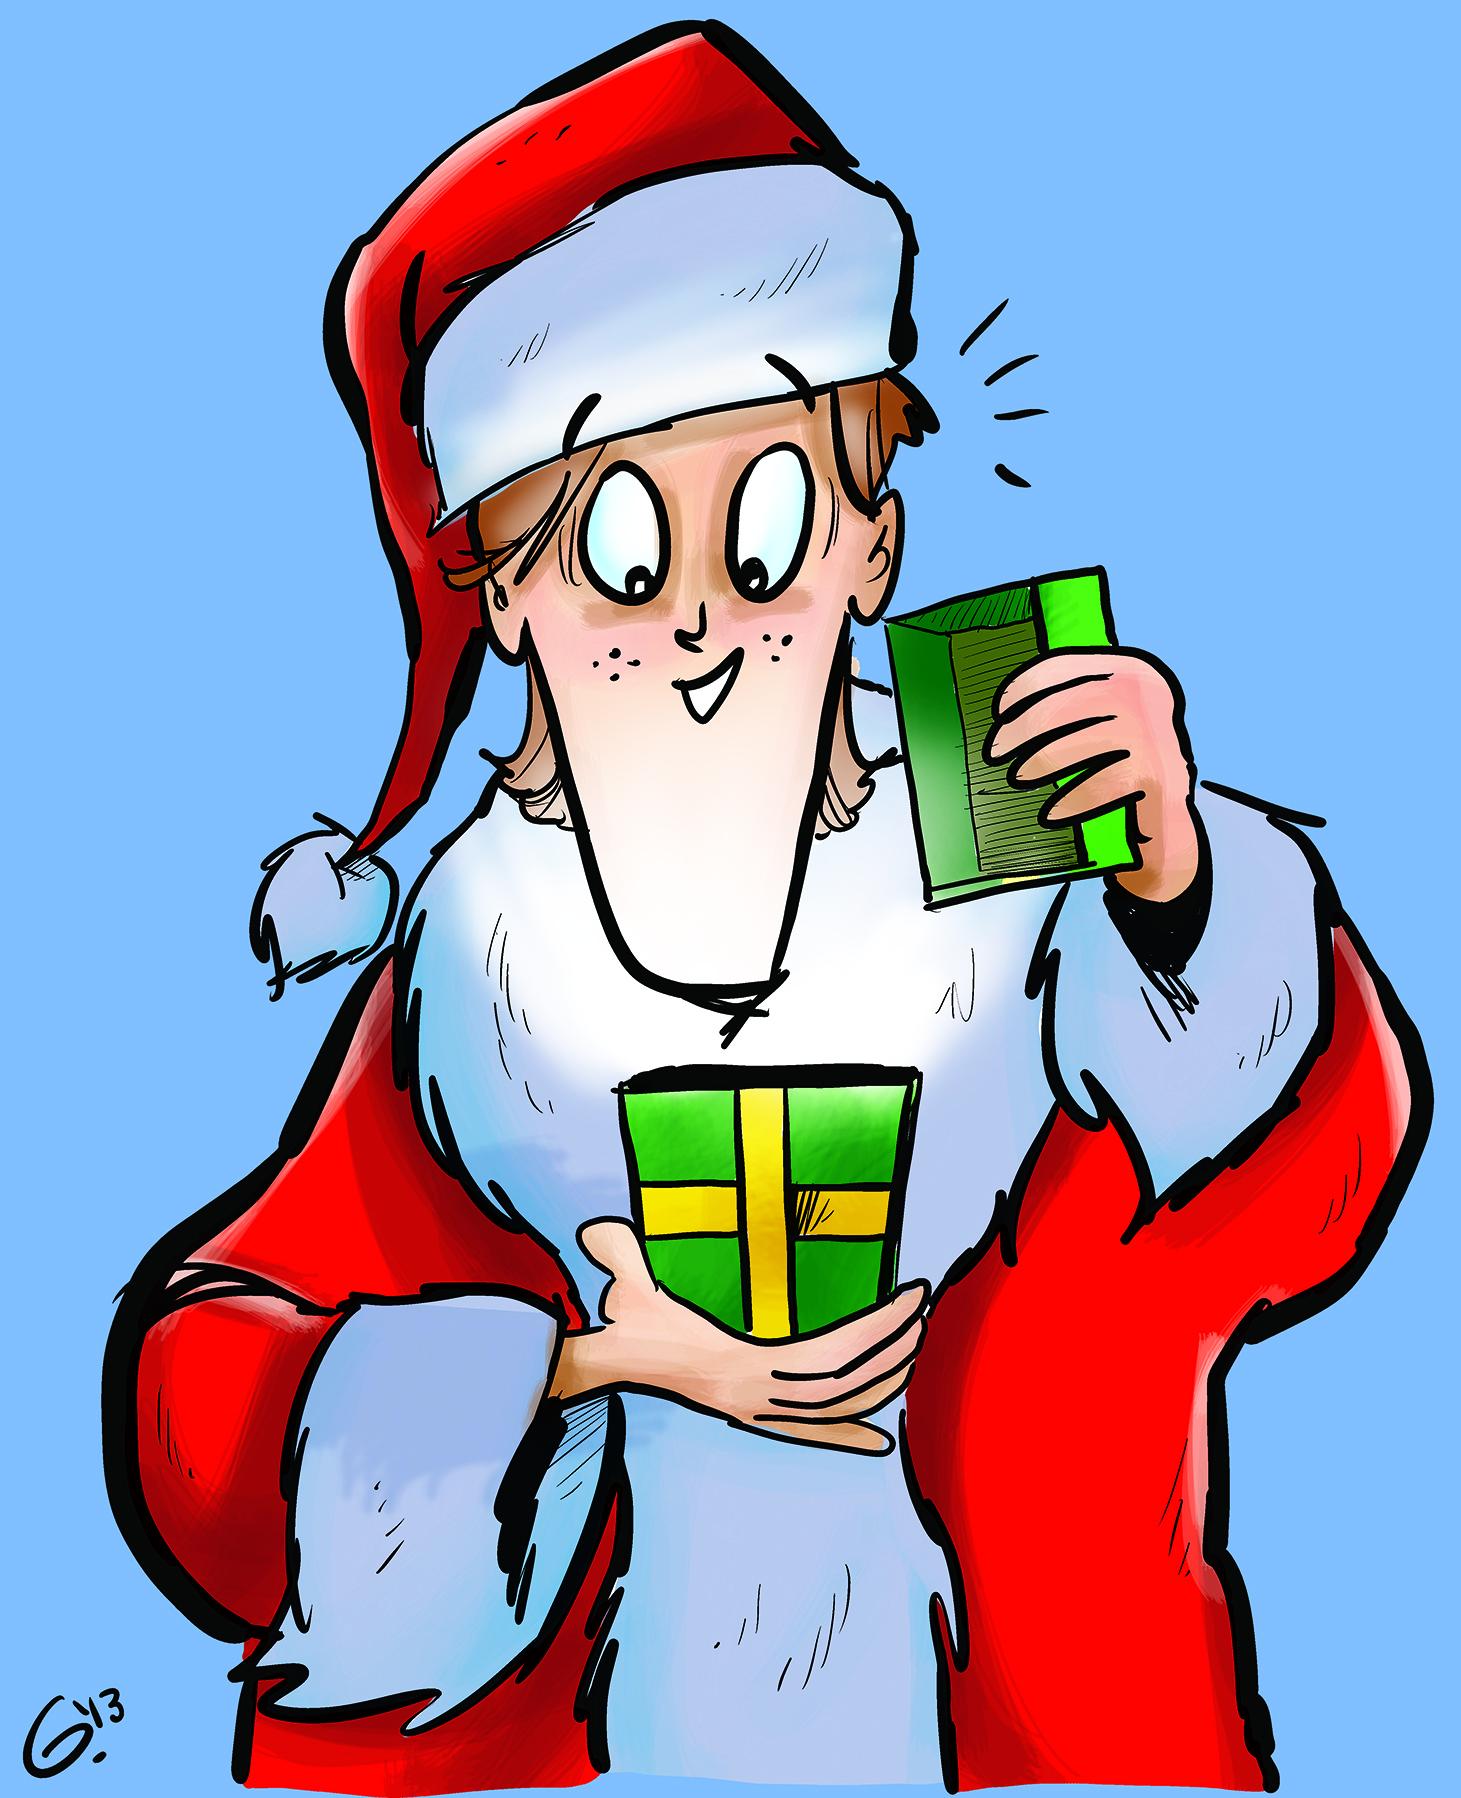 ChristmasFlat.jpg